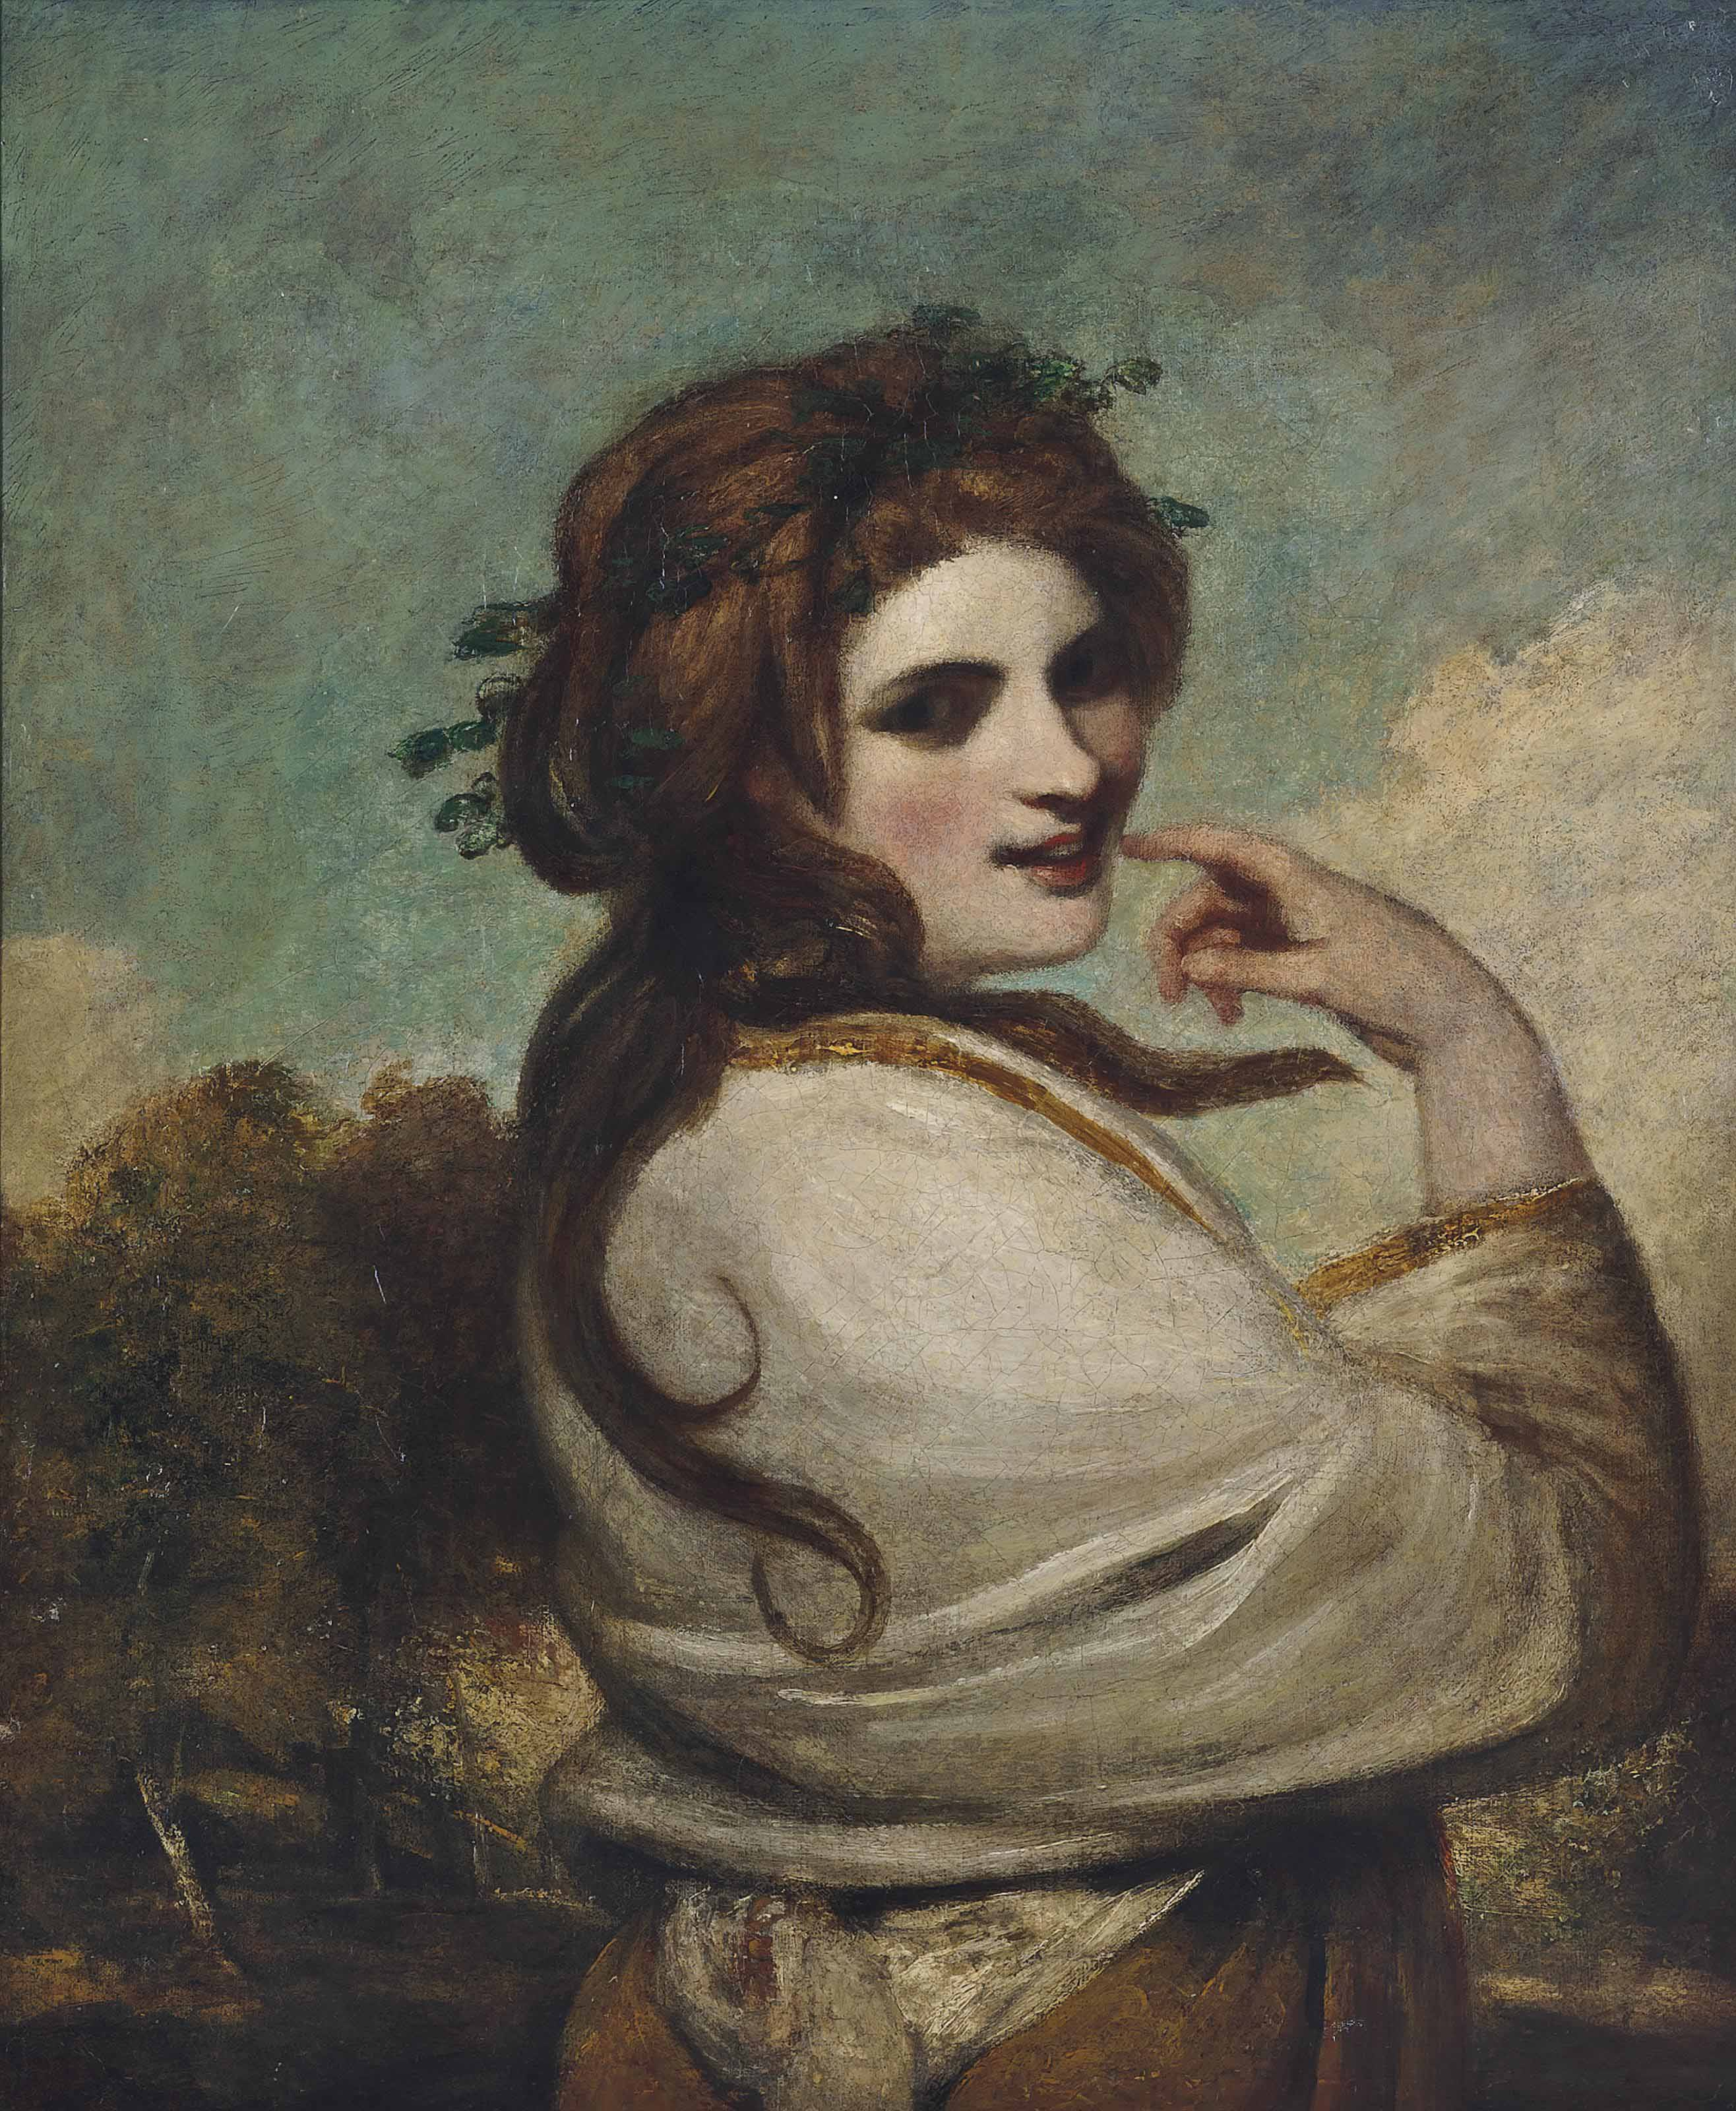 Sir Joshua Reynolds Paintings For Sale